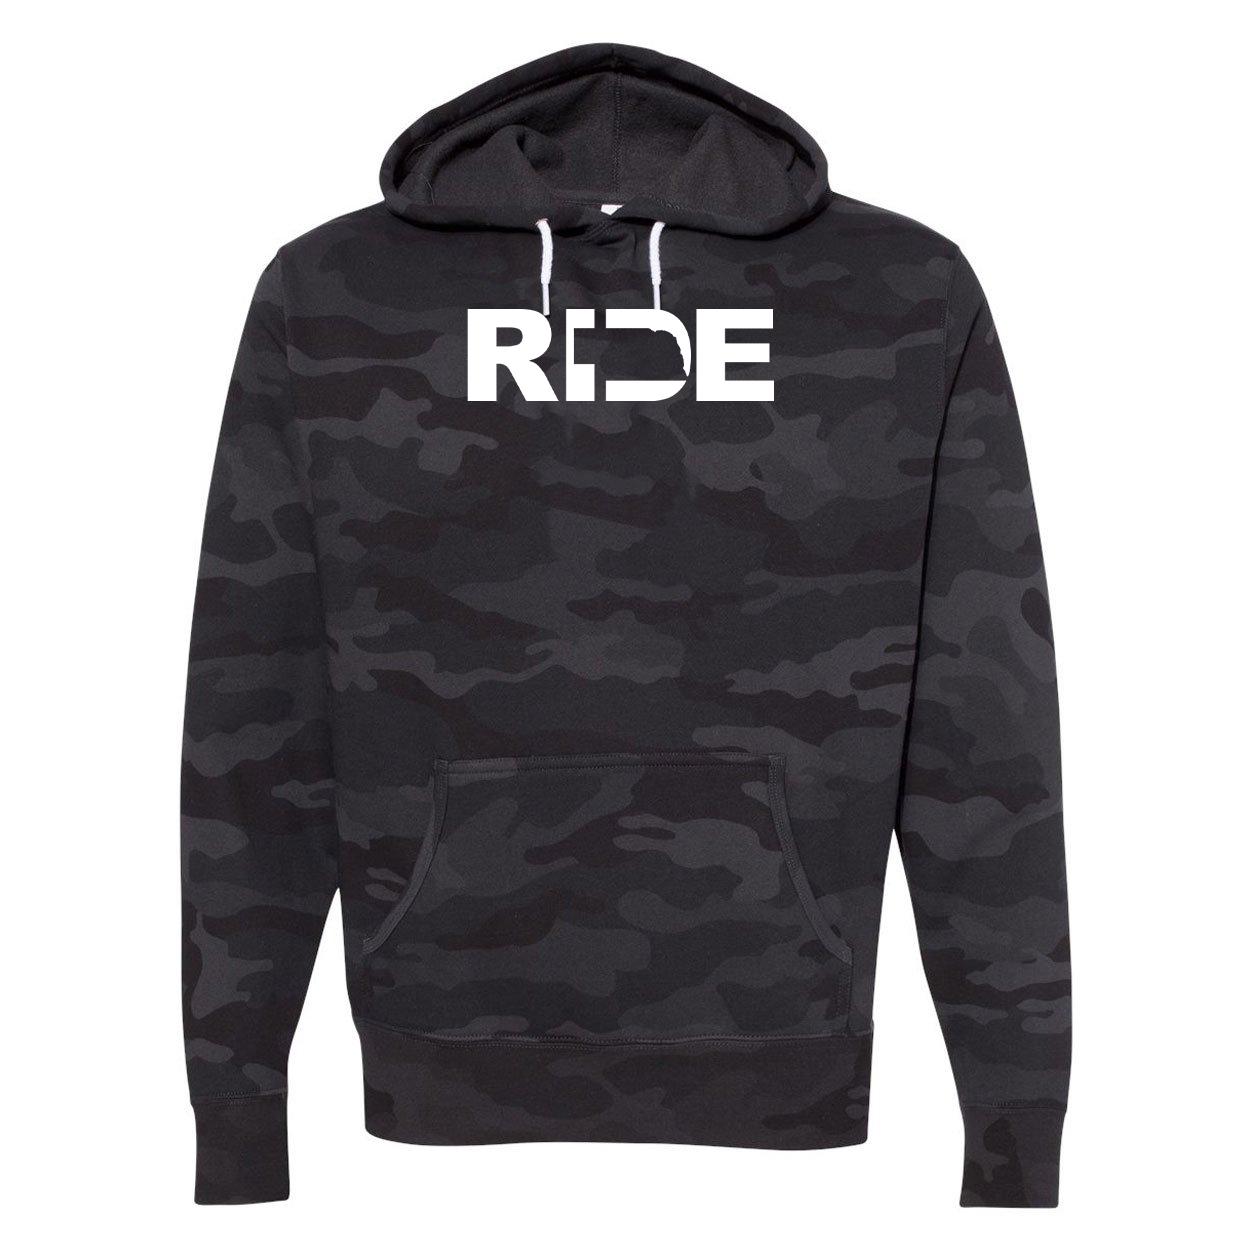 Ride Nebraska Classic Unisex Hooded Sweatshirt Black Camo (White Logo)